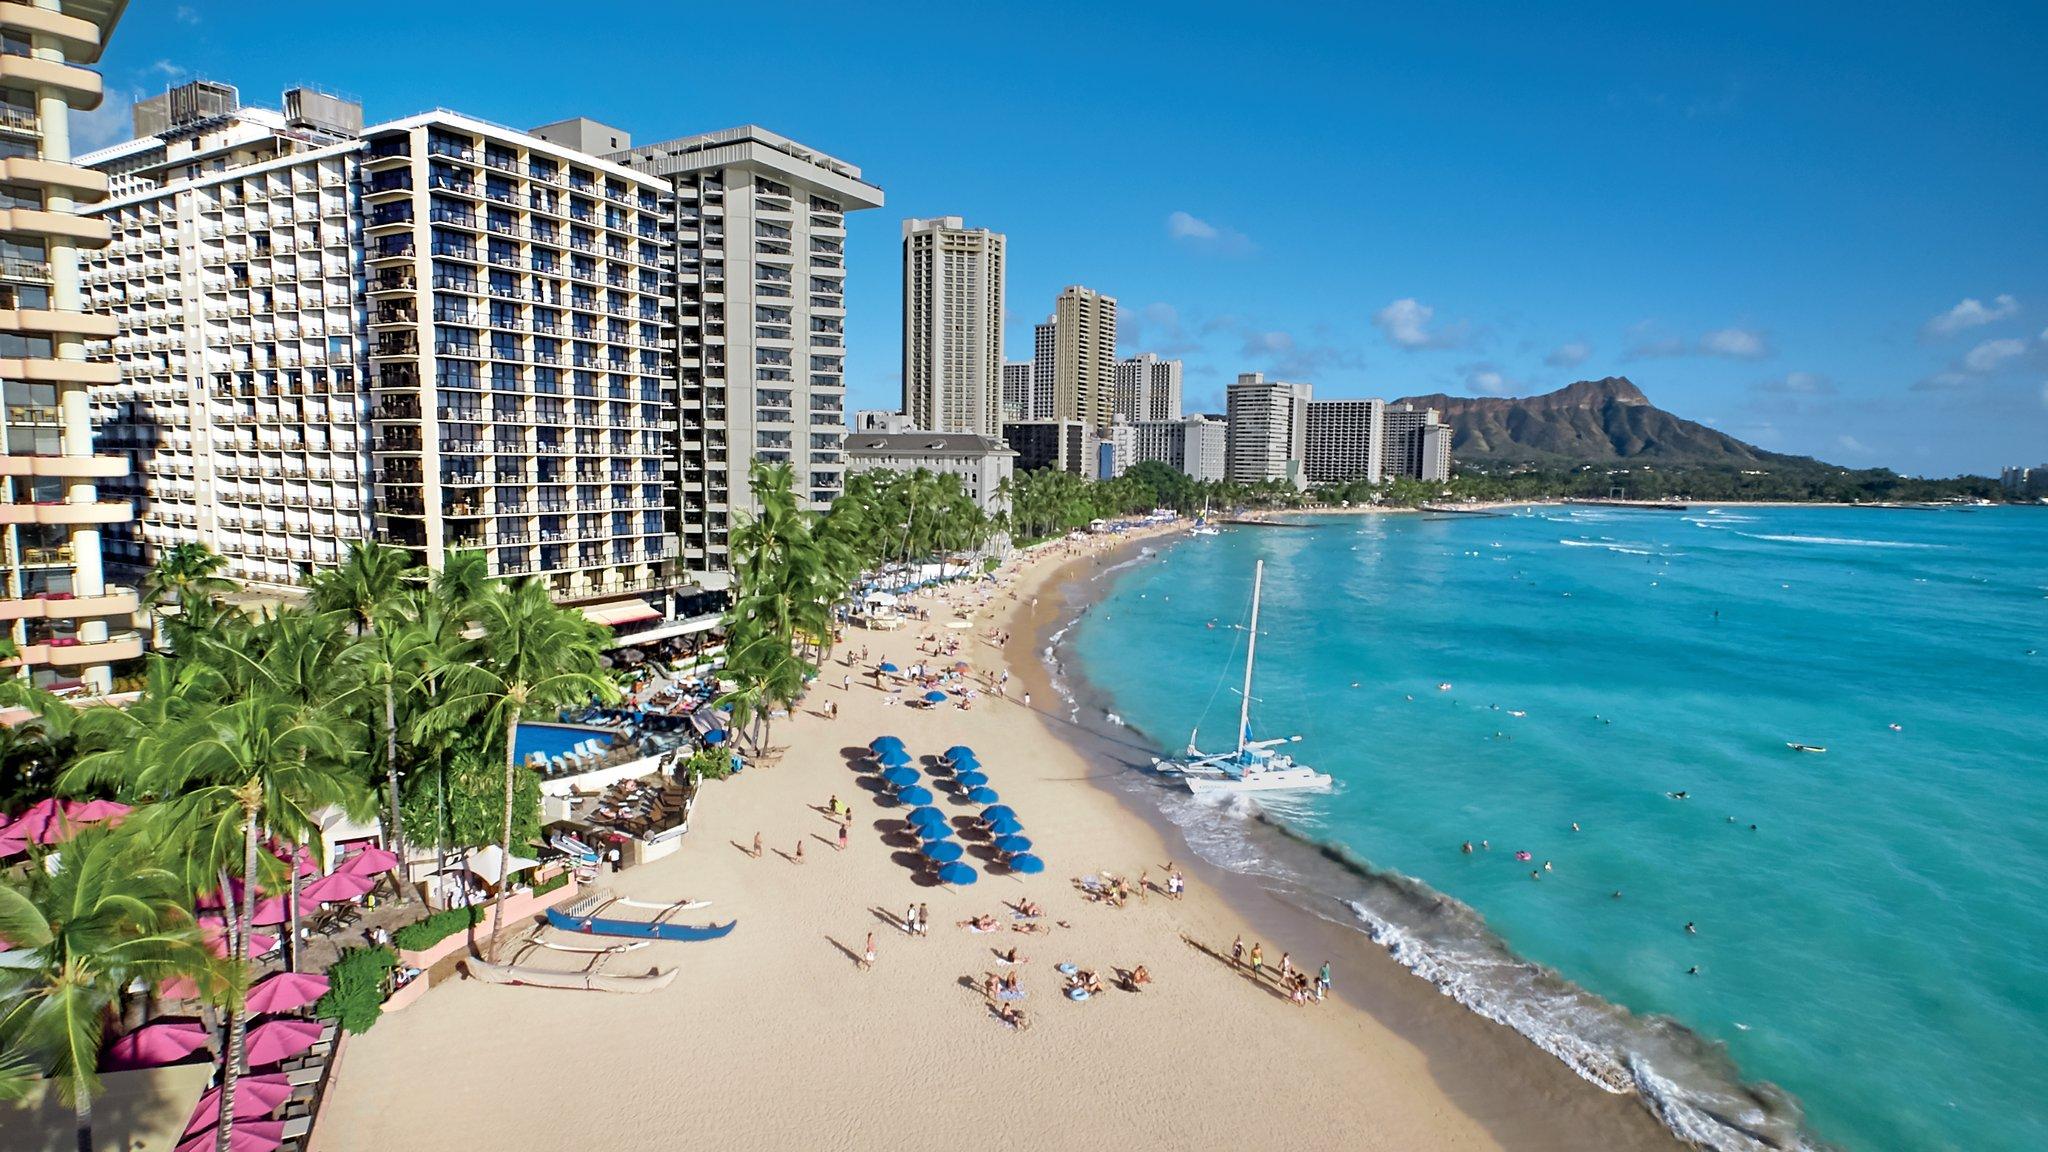 Outrigger Waikiki Beach Resort First Class Honolulu Hi Hotels